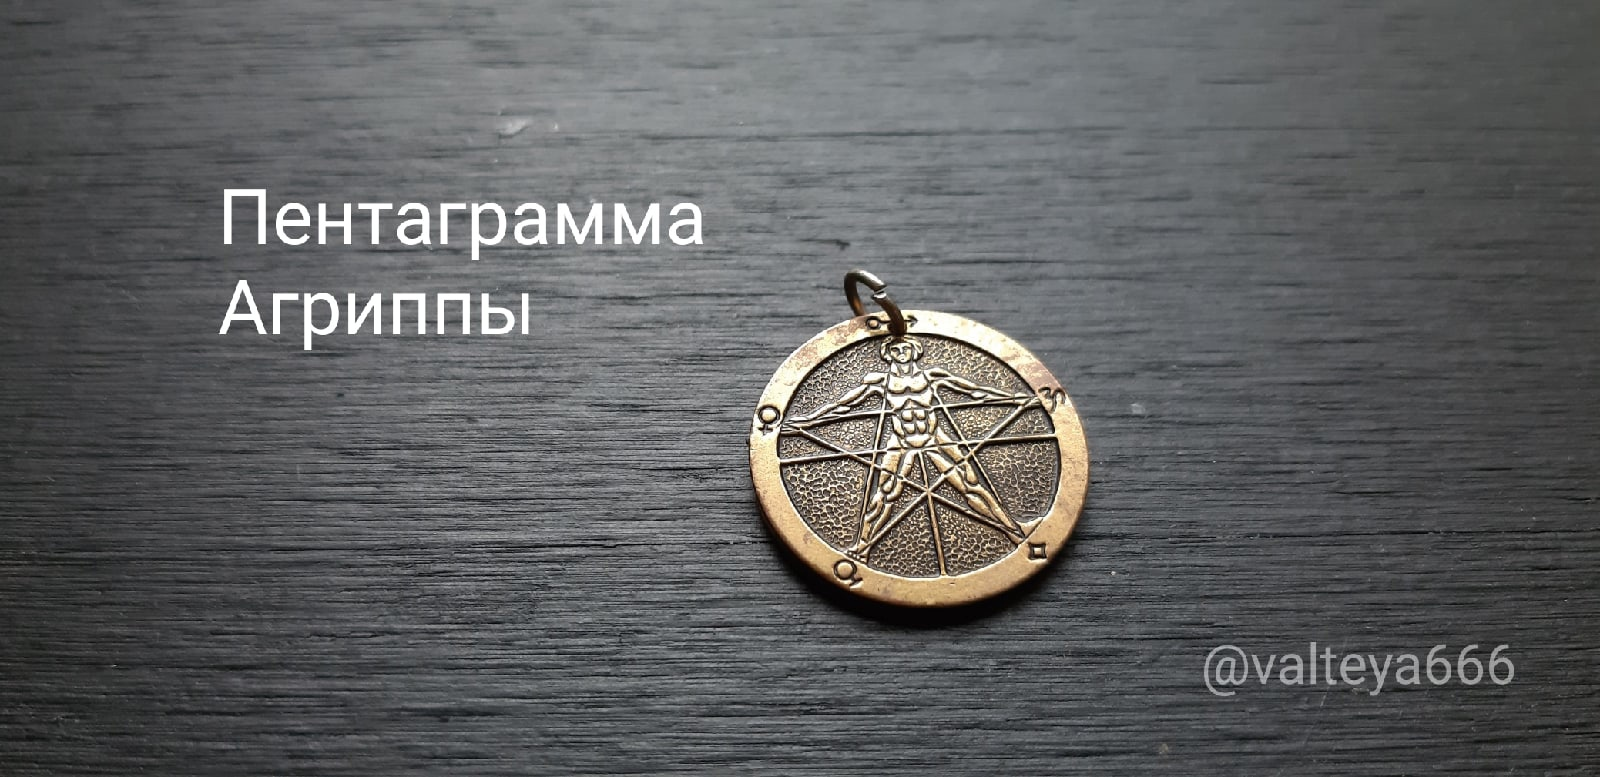 киев - Амулеты, талисманы, обереги из металла. - Страница 2 4kCqb19GttQ